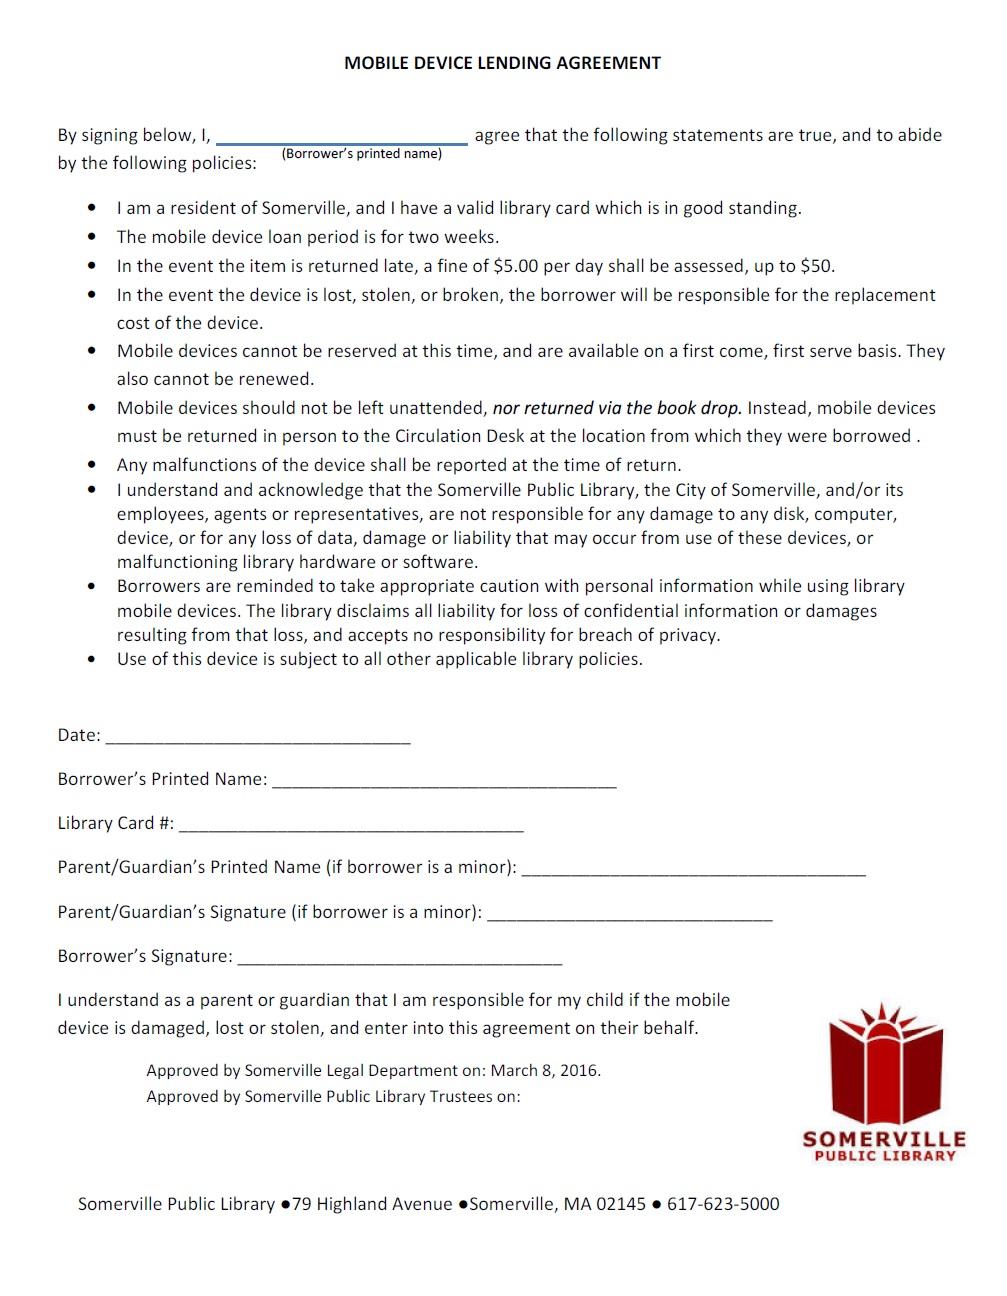 Mobile device lending agreement somerville public library blog archive platinumwayz